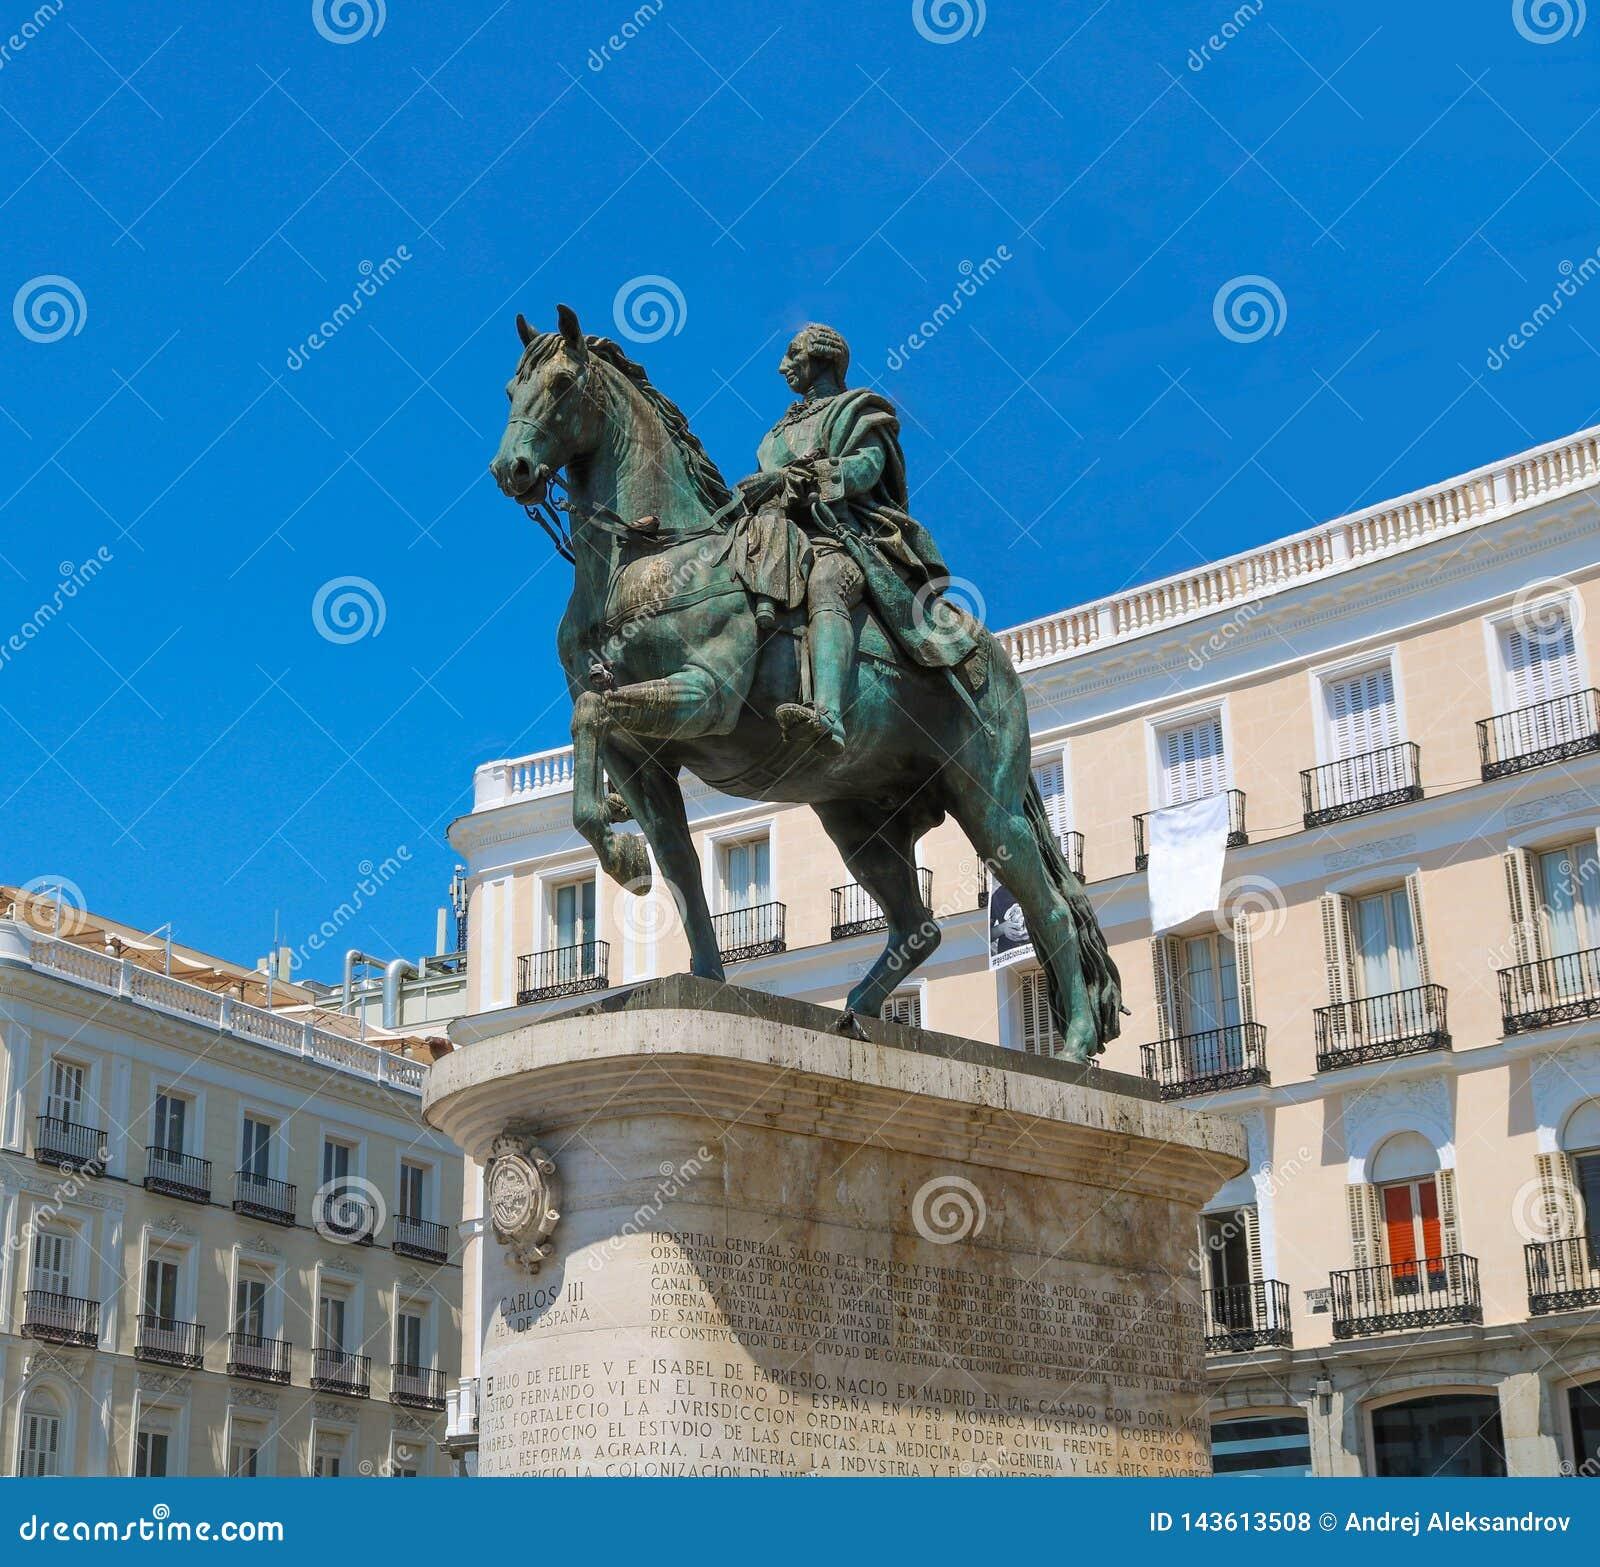 Standbeeld van Carlos het derde in puerta del sol, Madrid